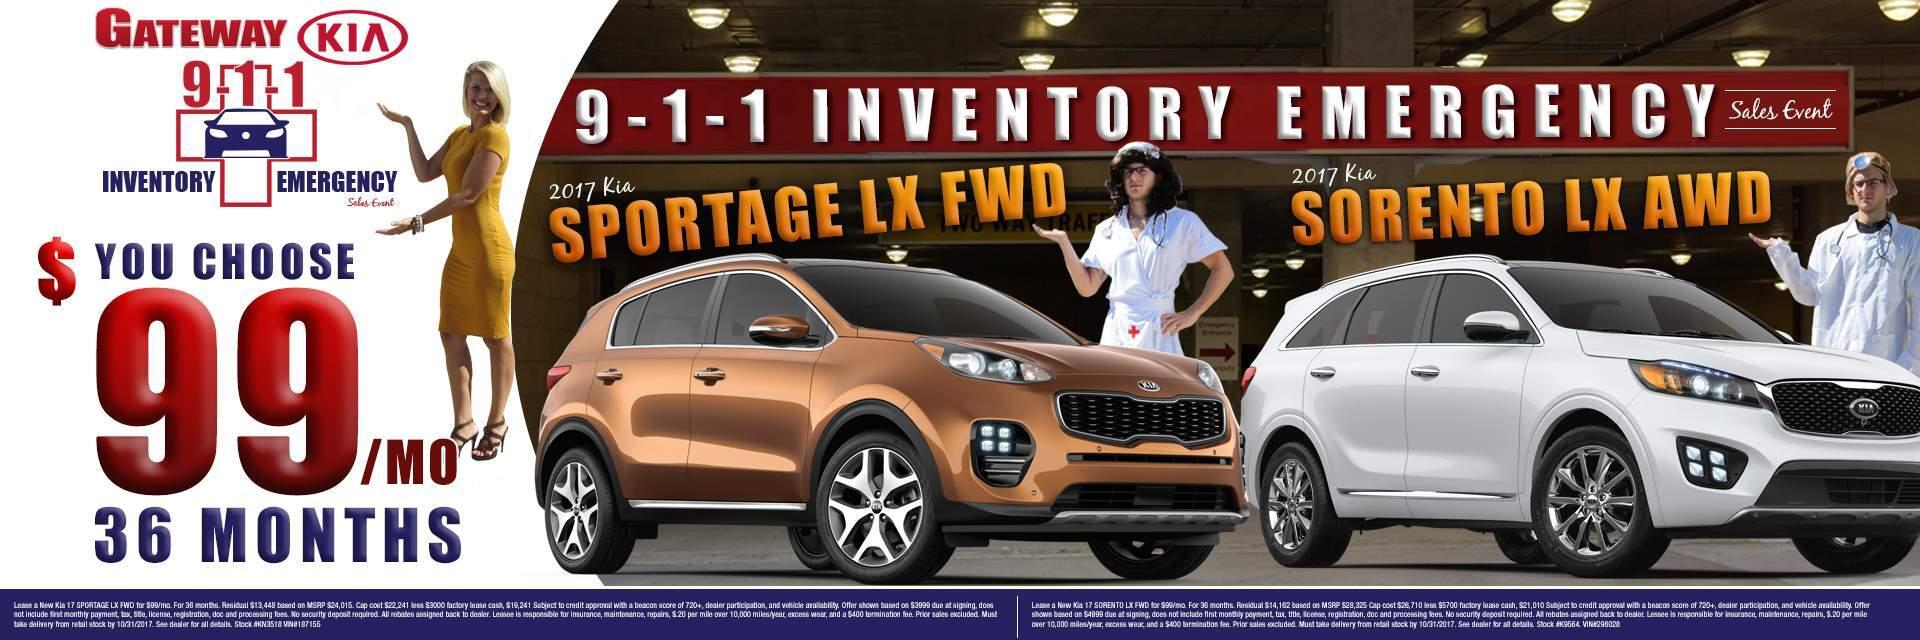 Hyundai kia motor finance company retail - Sportage Or Sorento 99 Mo You Choose